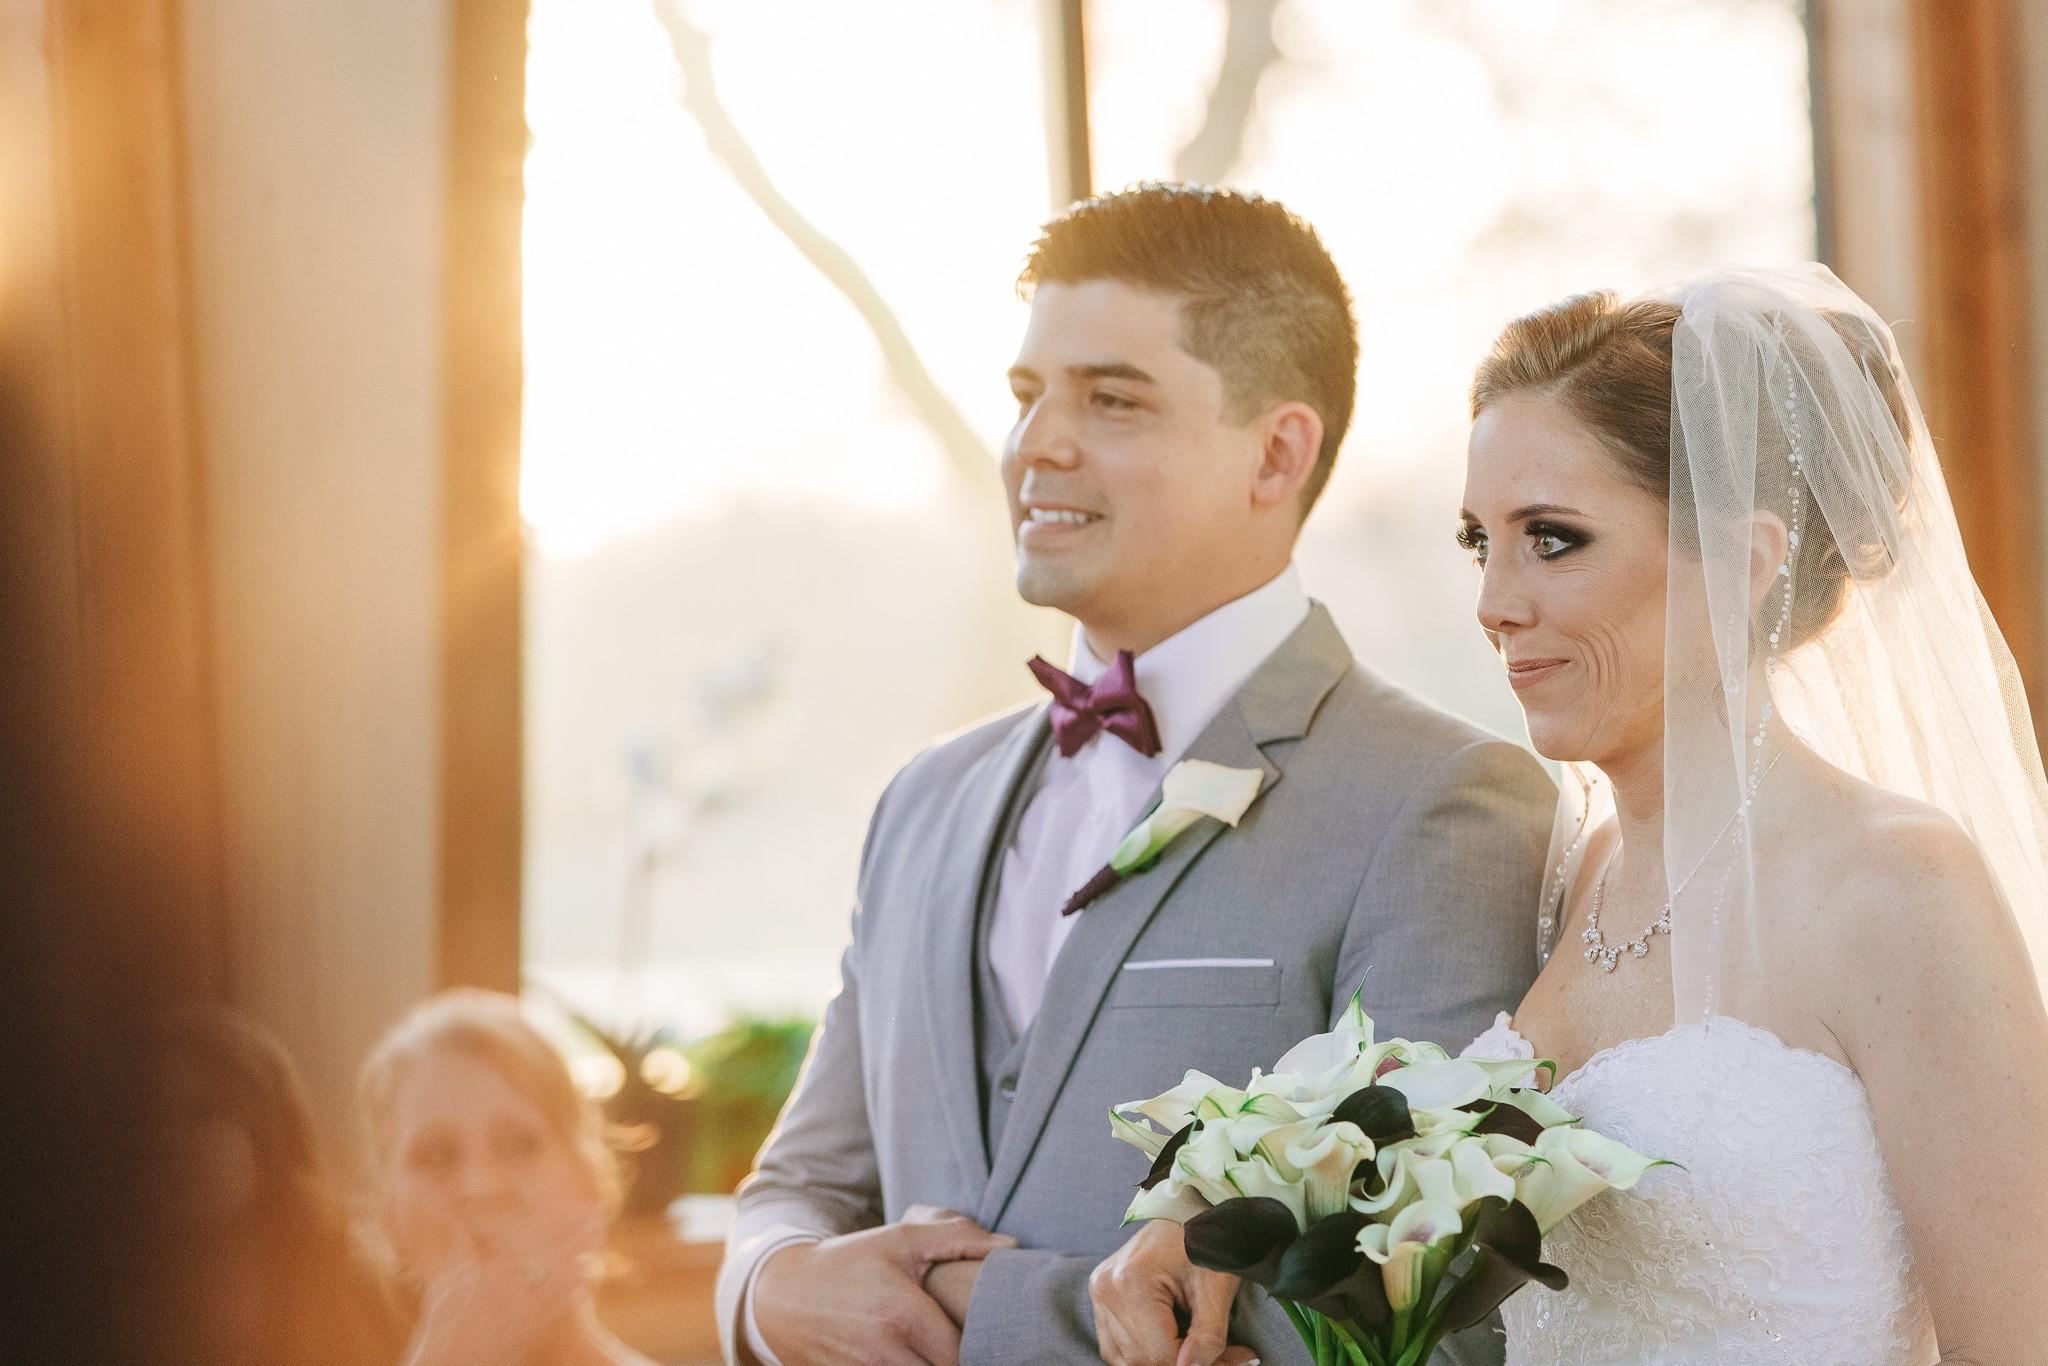 Aubrey-Texas-Harmony-Chapel-Wedding-Florist-David-Co.-8.jpg